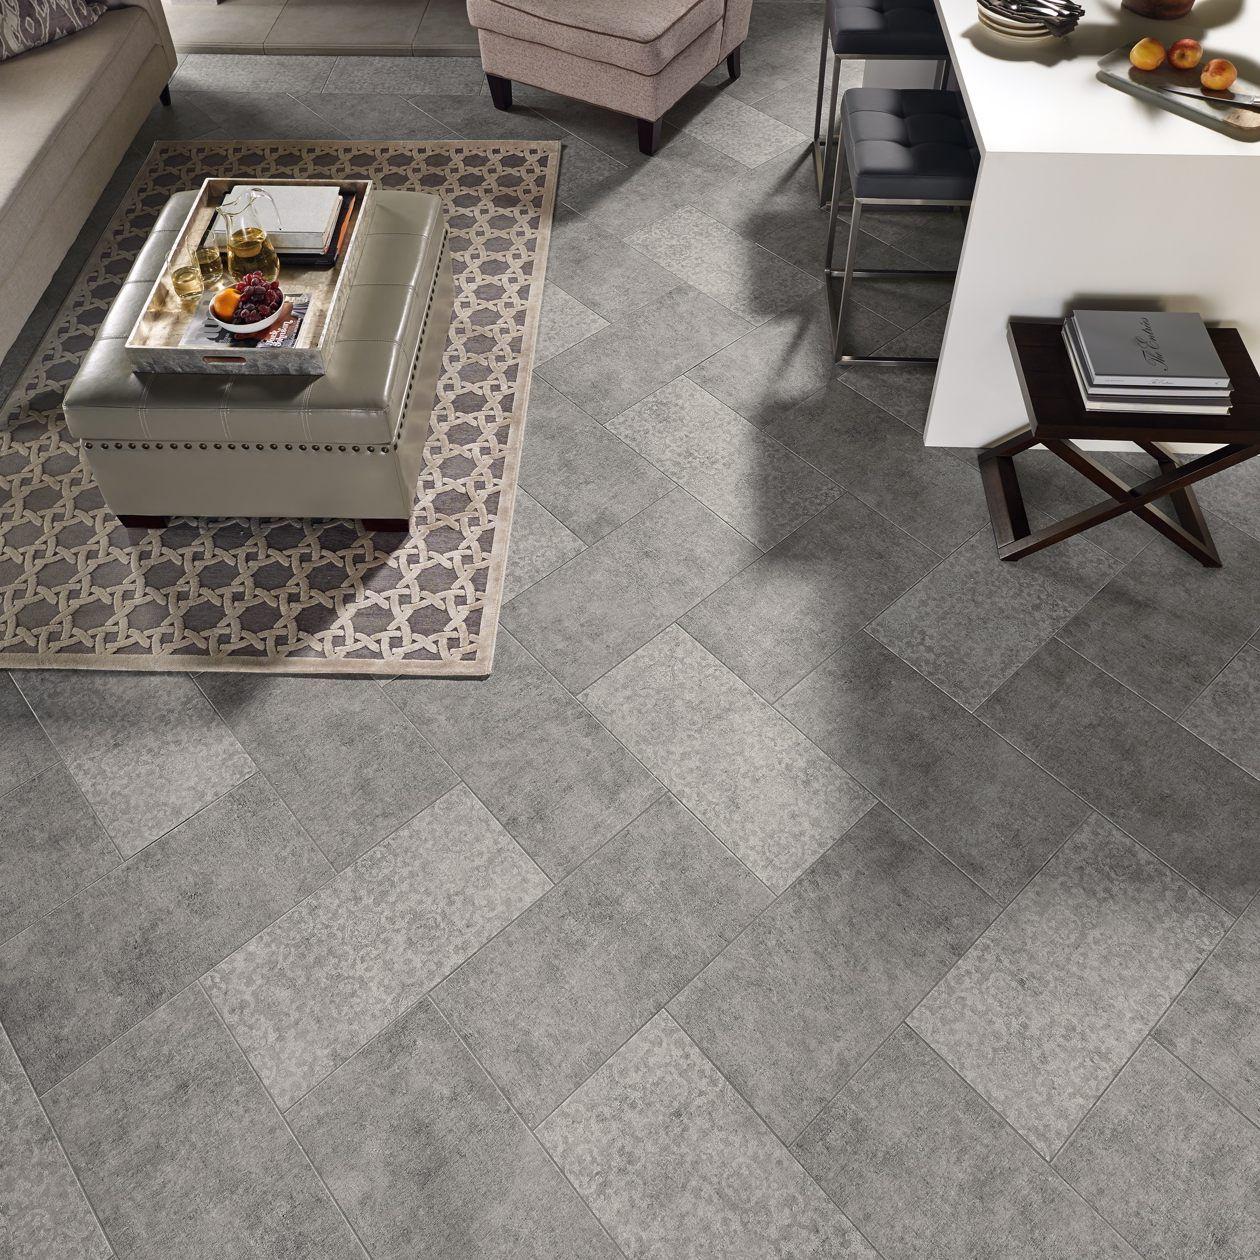 Pin By JE Simas Floors On Flooring LVT Pinterest Flooring Ideas - Paint vinyl floor look like stone